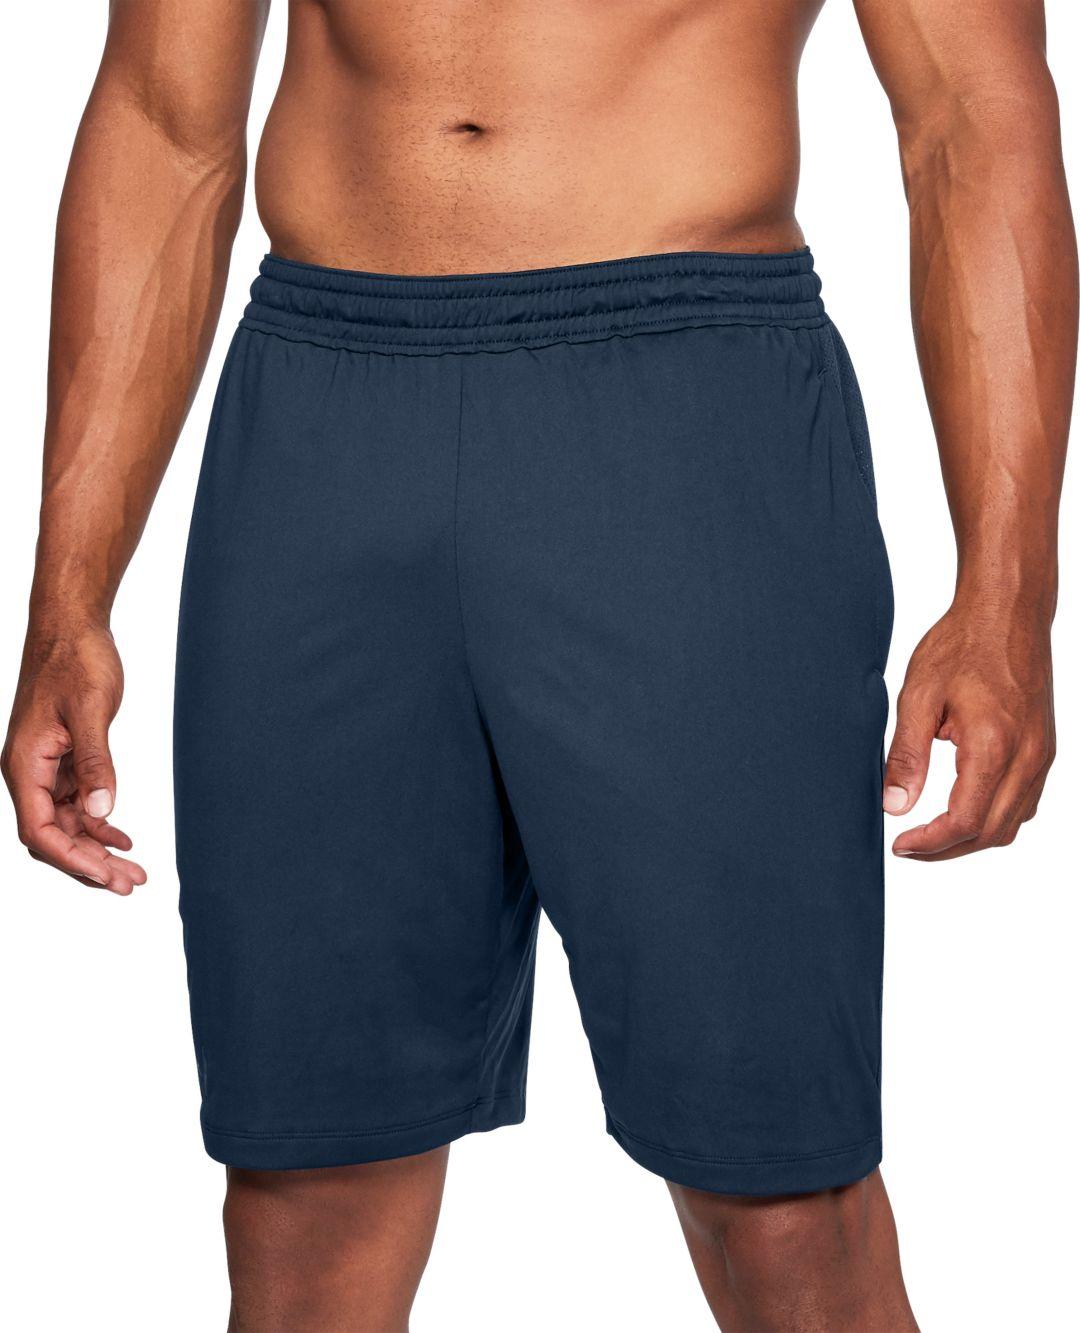 019c450f8c Under Armour Men's MK-1 Shorts | DICK'S Sporting Goods